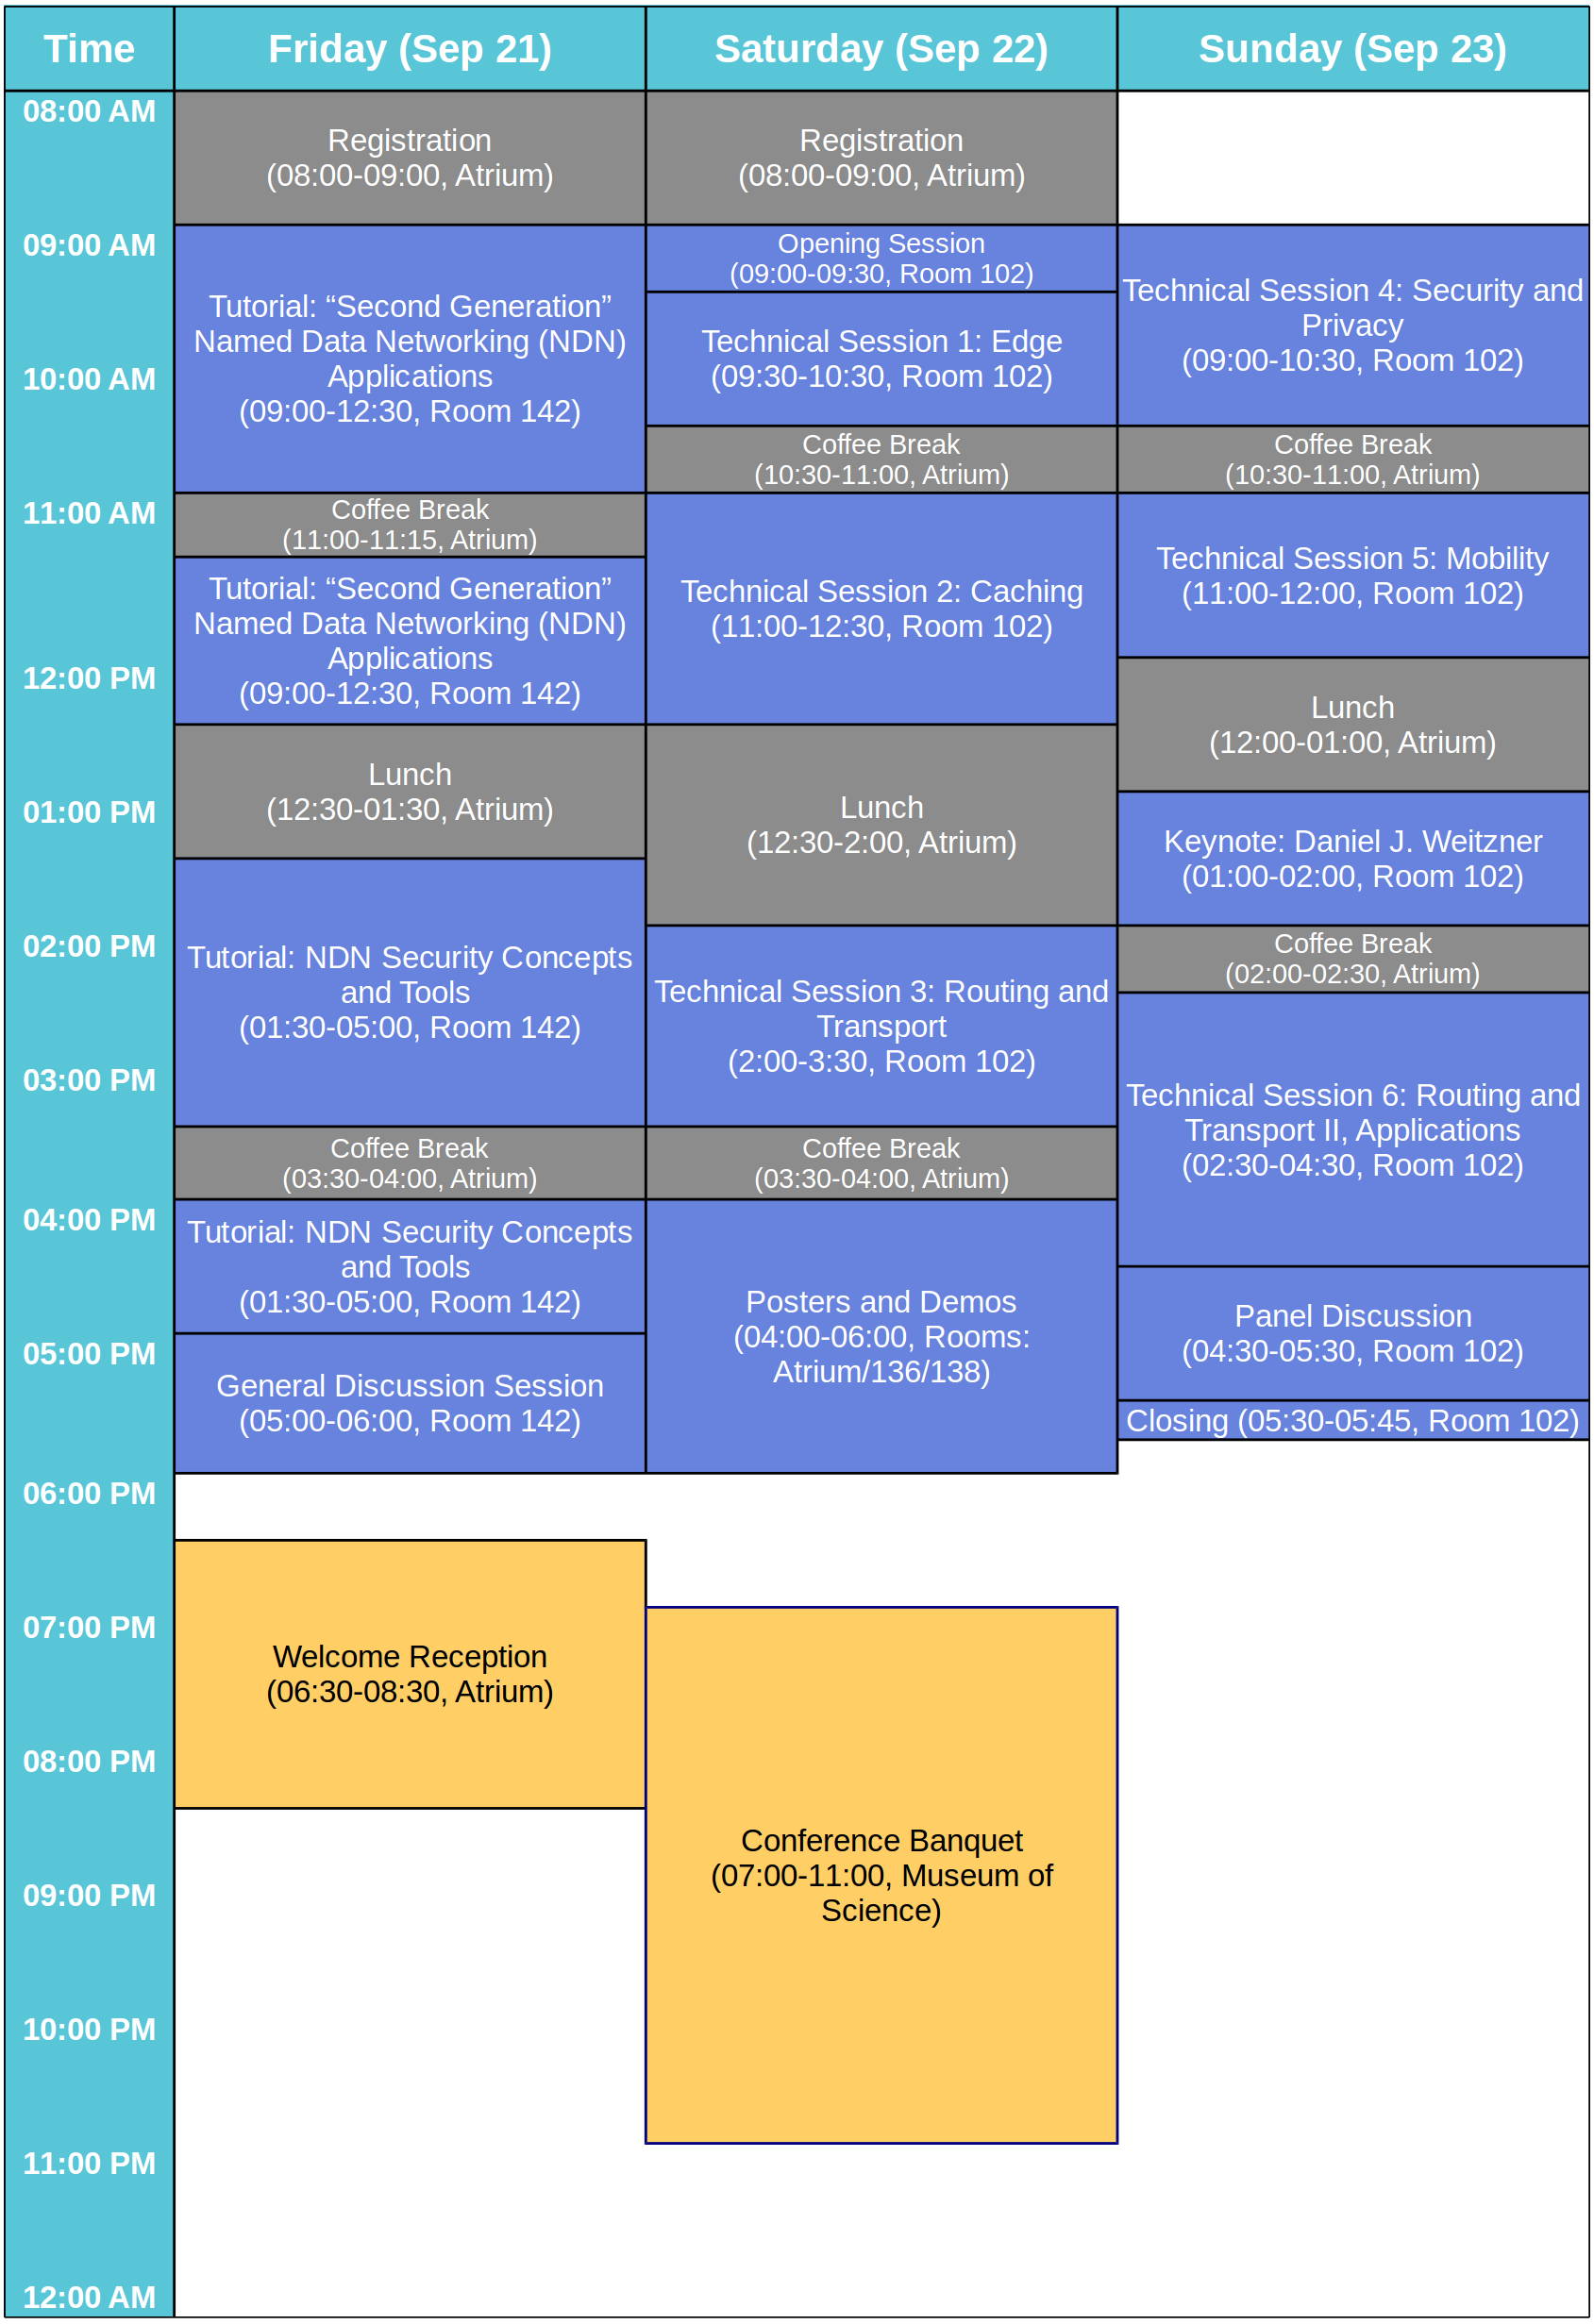 Conference Program - ACM ICN 2018